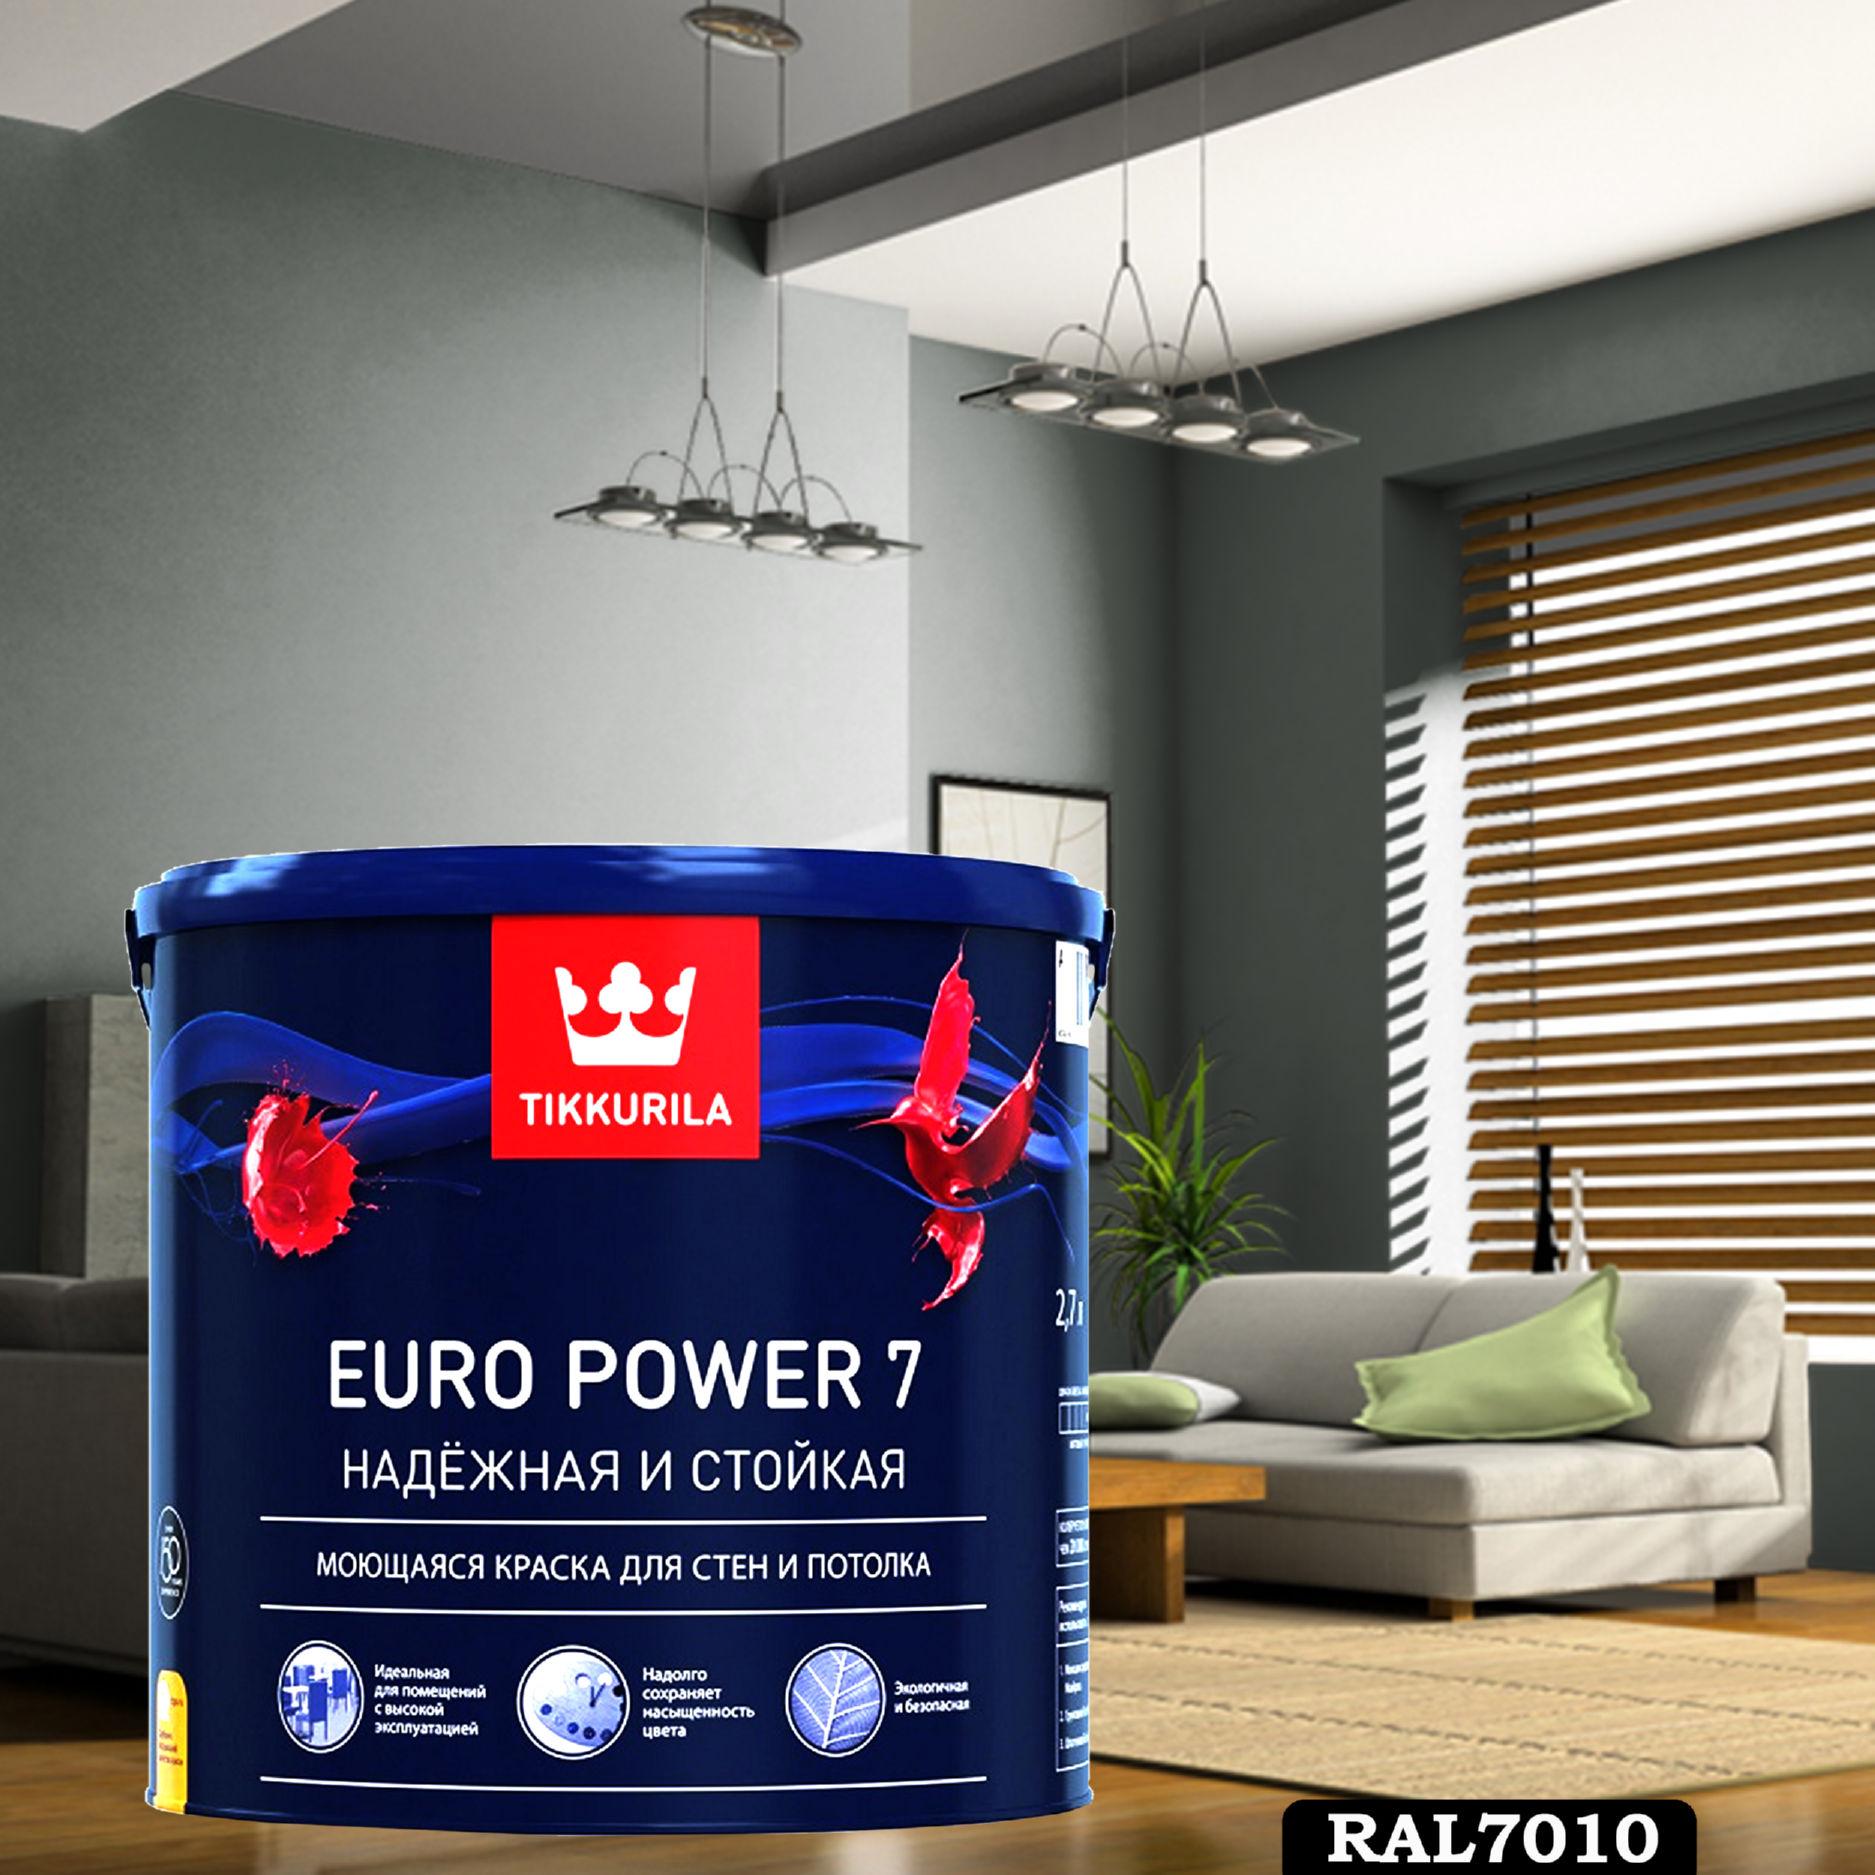 Фото 10 - Краска TIKKURILA Euro Power 7,  RAL 7010 Серый-брезент, латексная моющаяся матовая интерьерная, 9 л.